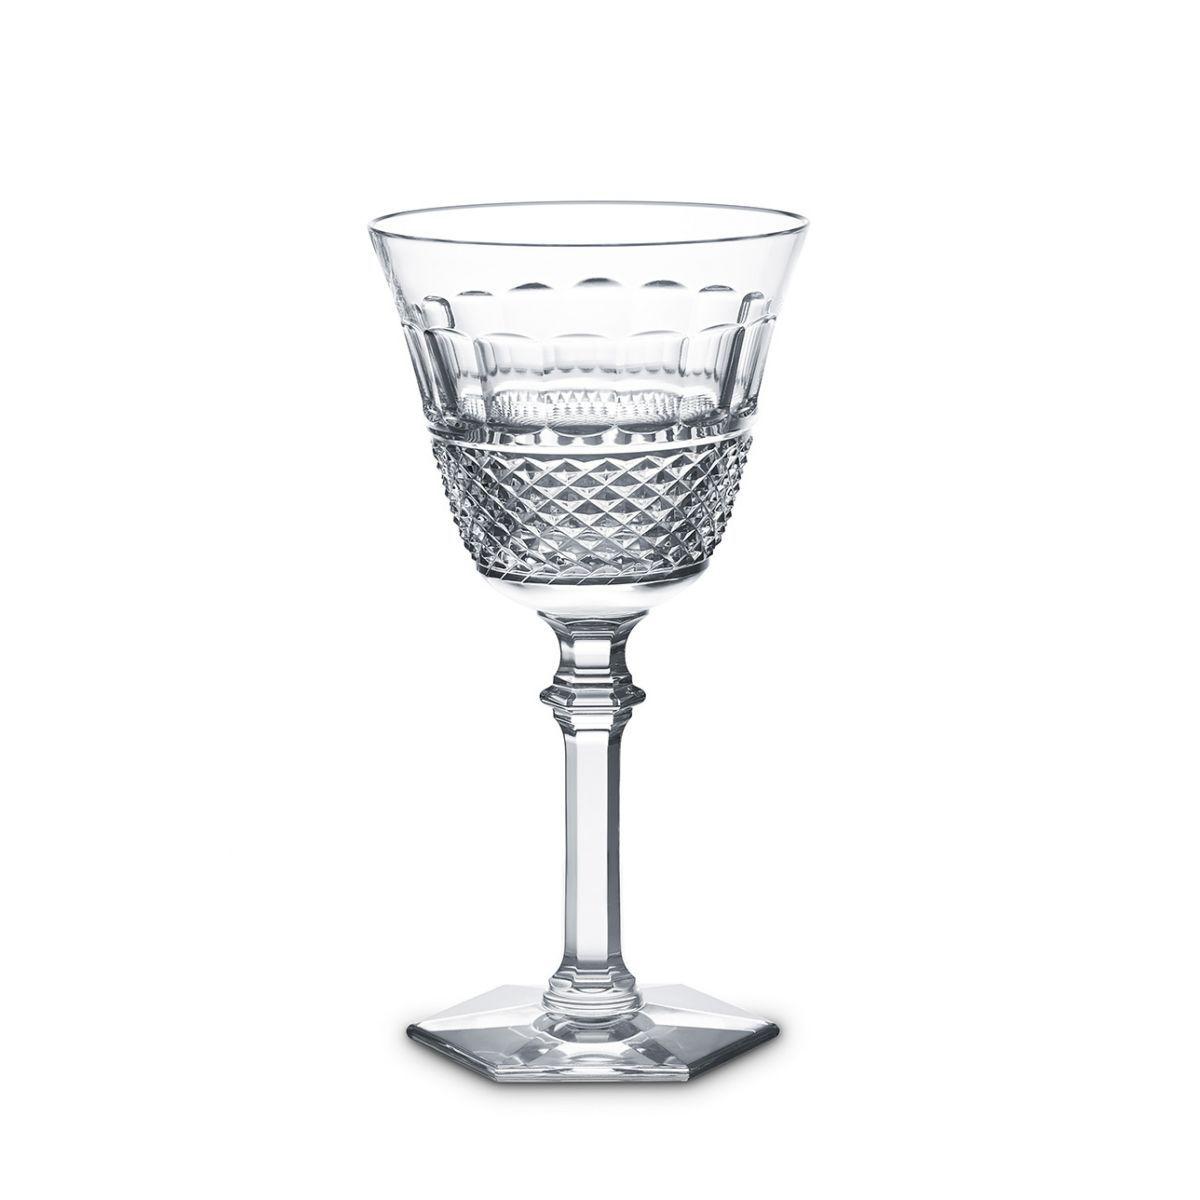 Taça Vinho Tinto Diamant 240ml, Baccarat, 2807174